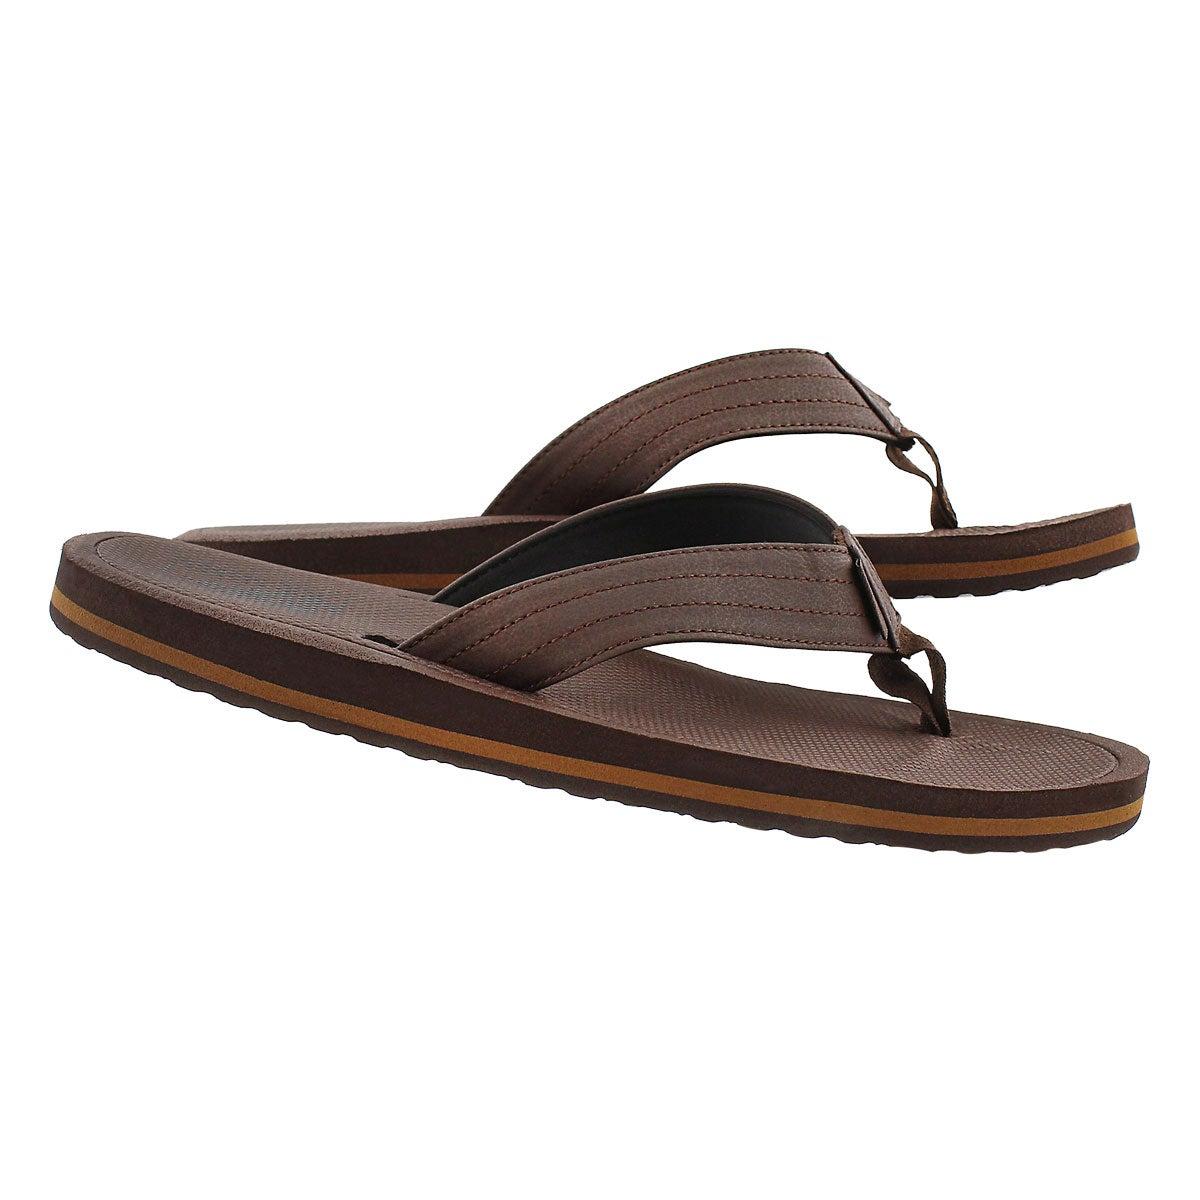 Mns Palmdale brown/black flip flop